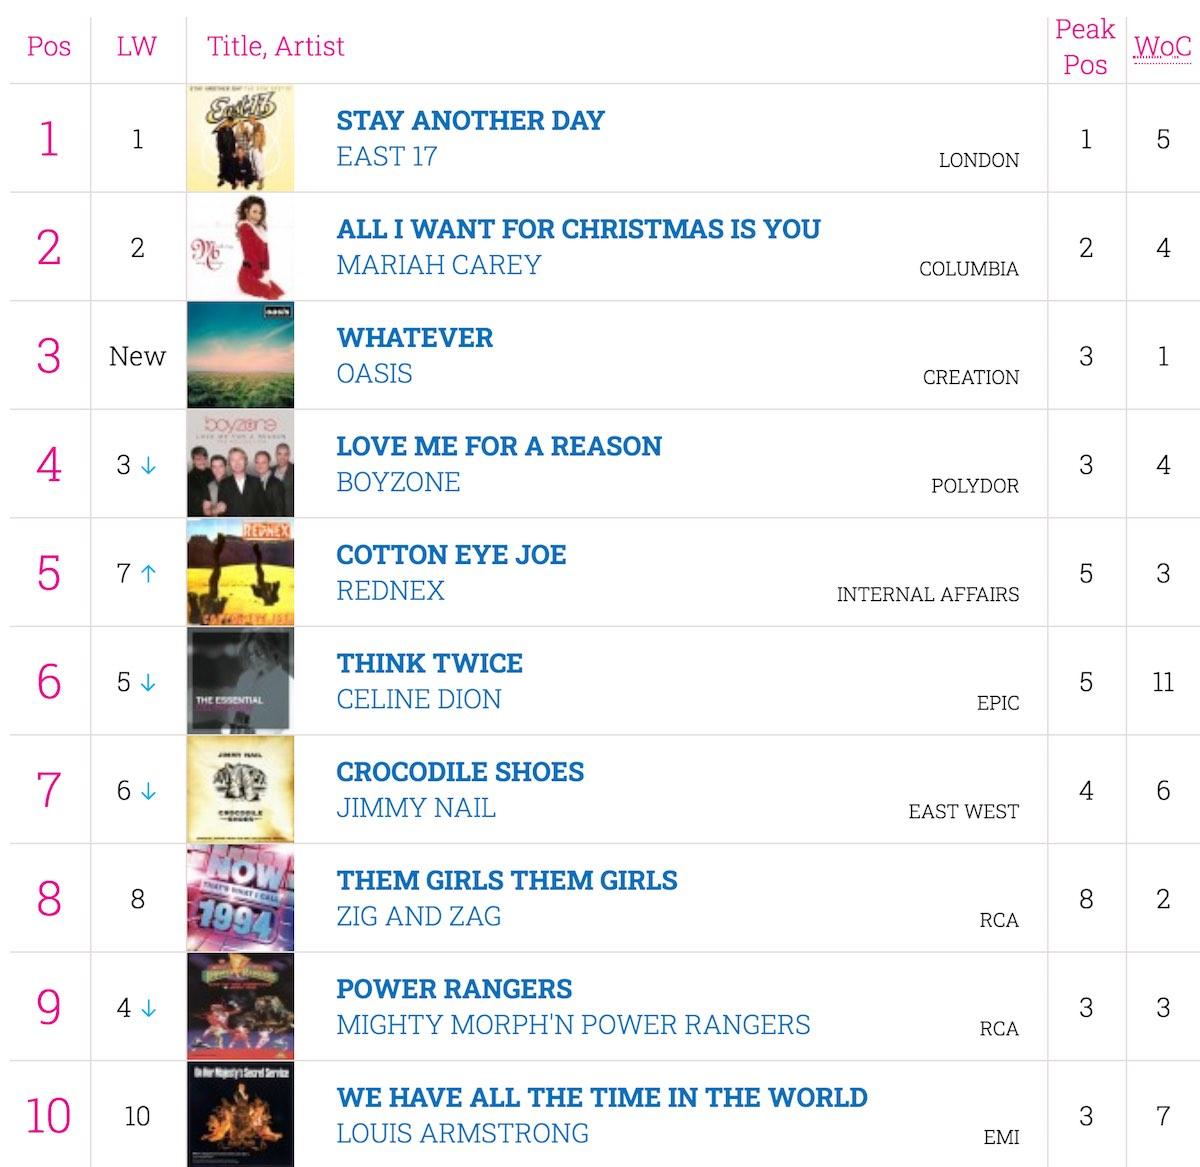 25th December 1994 UK Charts